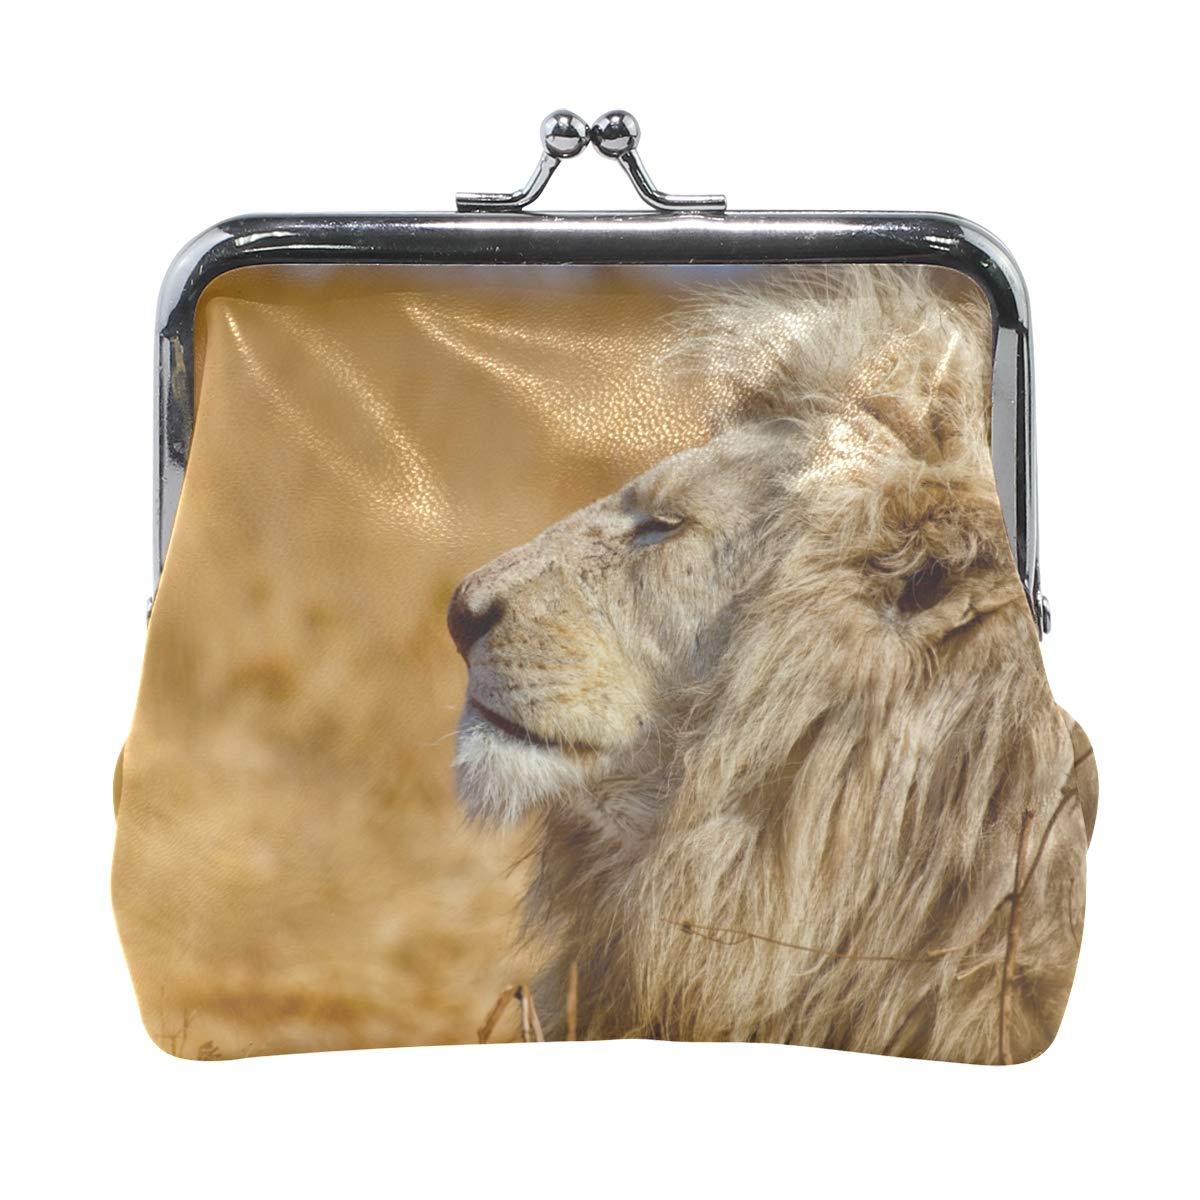 Rh Studio Coin Purse Lion Profile Predator King Of Beasts Print Wallet Exquisite Clasp Coin Purse Girls Women Clutch Handbag